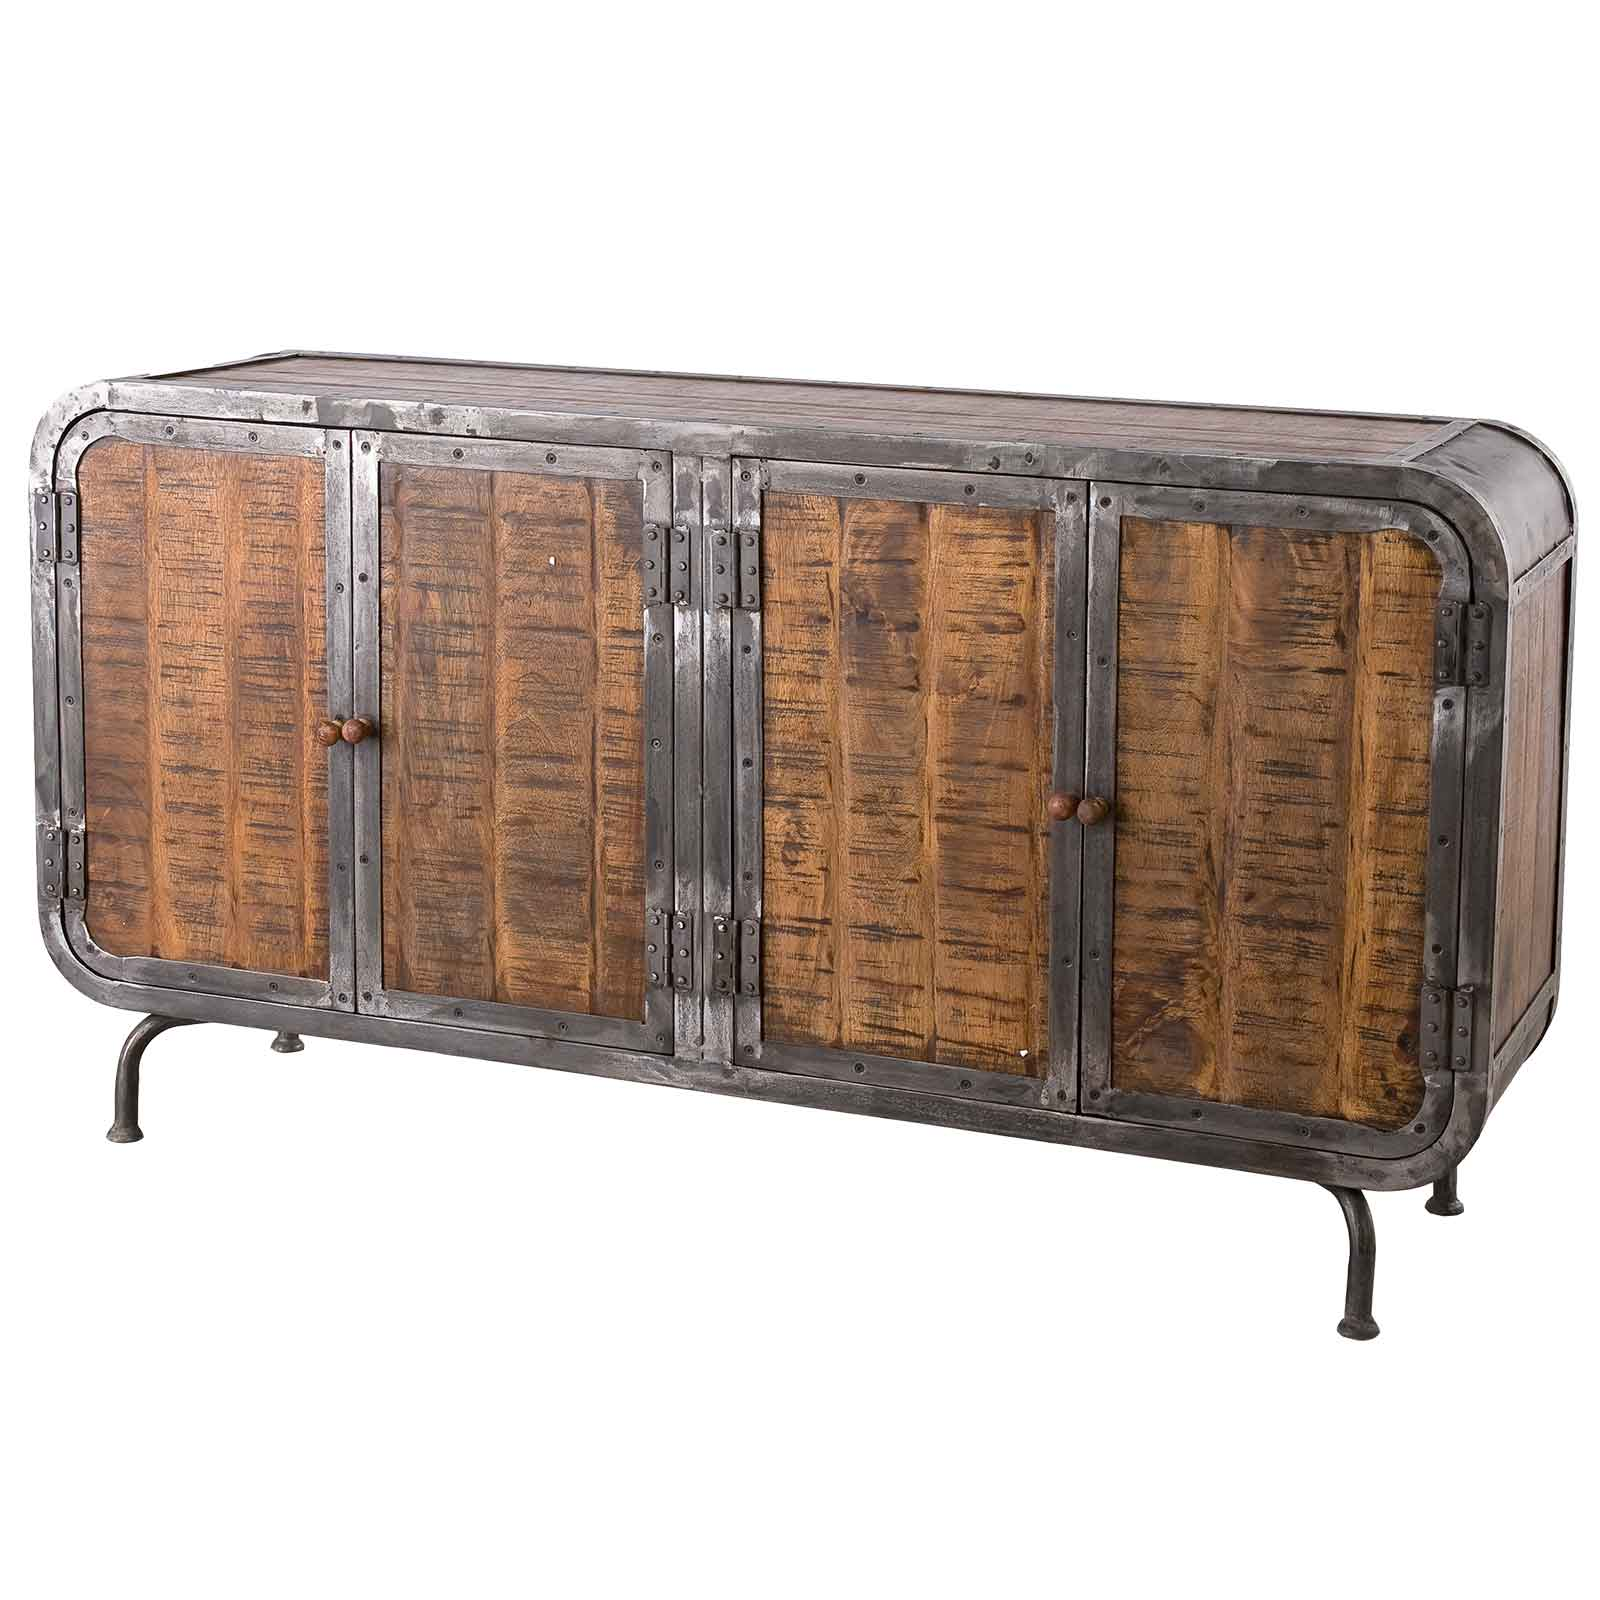 sideboard saigon aus massivholz und metall 160 x 85 cm. Black Bedroom Furniture Sets. Home Design Ideas